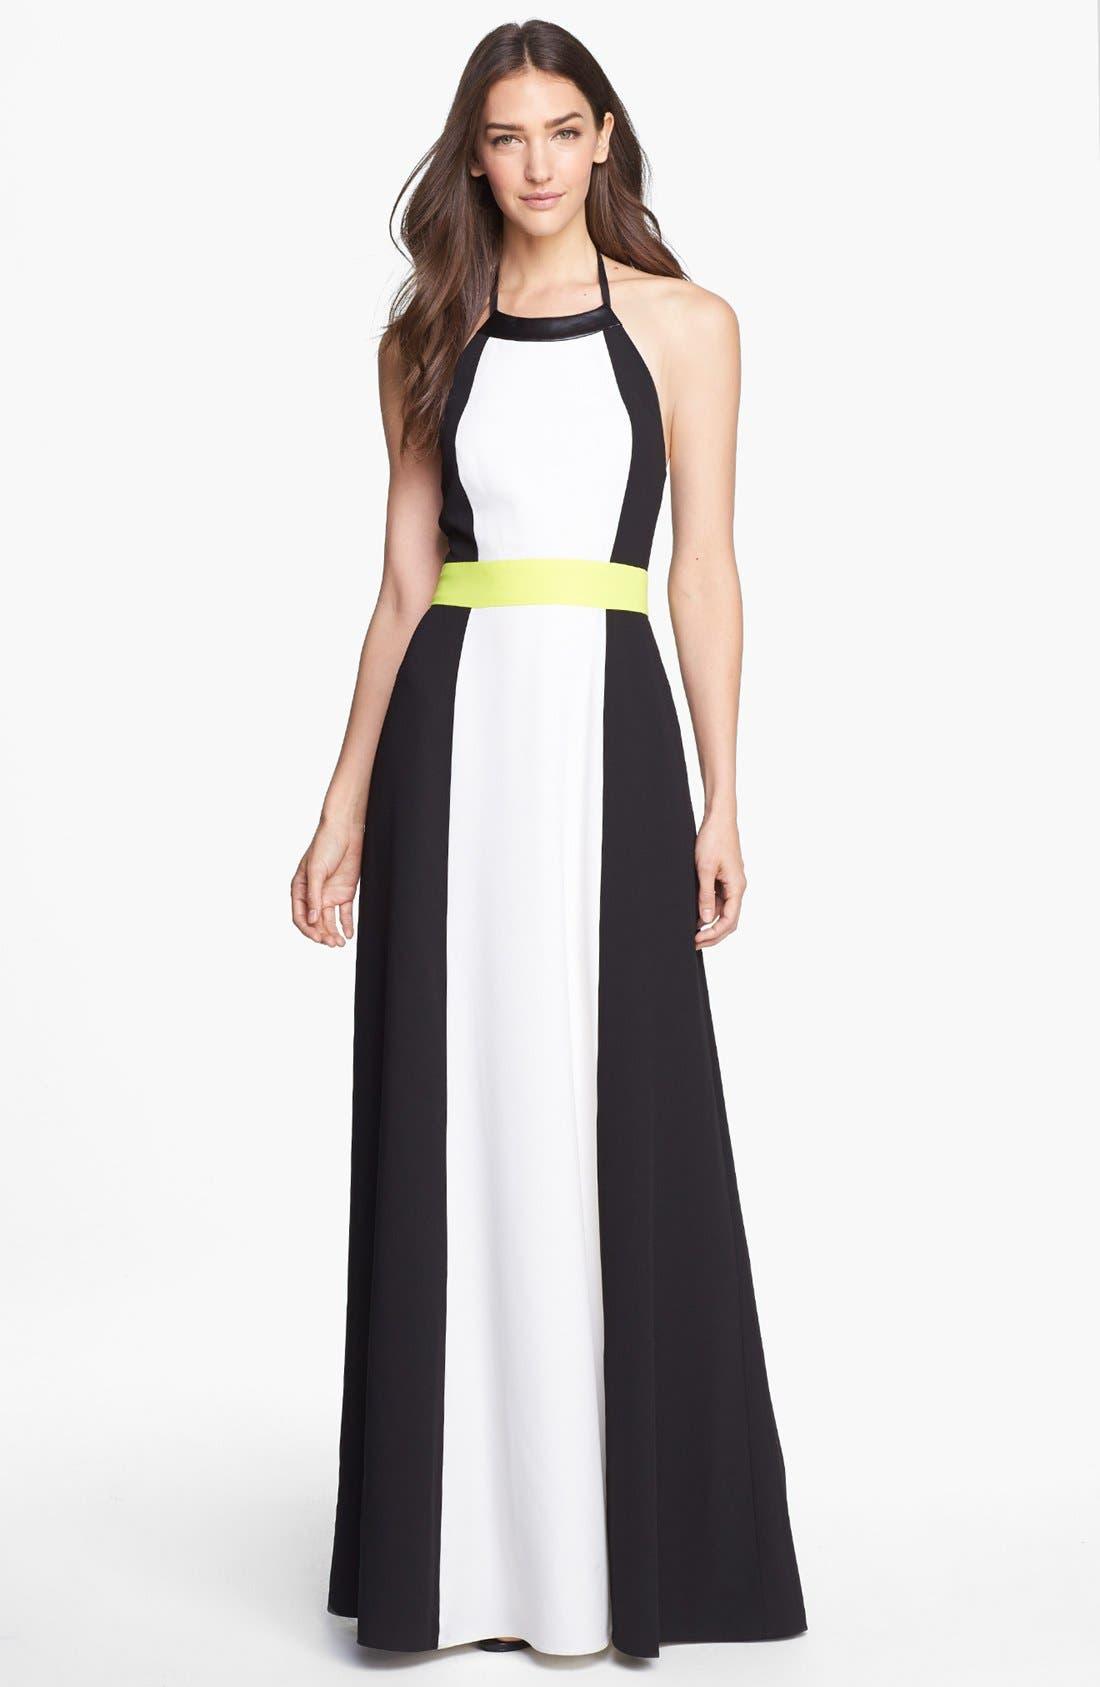 Alternate Image 1 Selected - Vince Camuto Colorblock Halter Maxi Dress